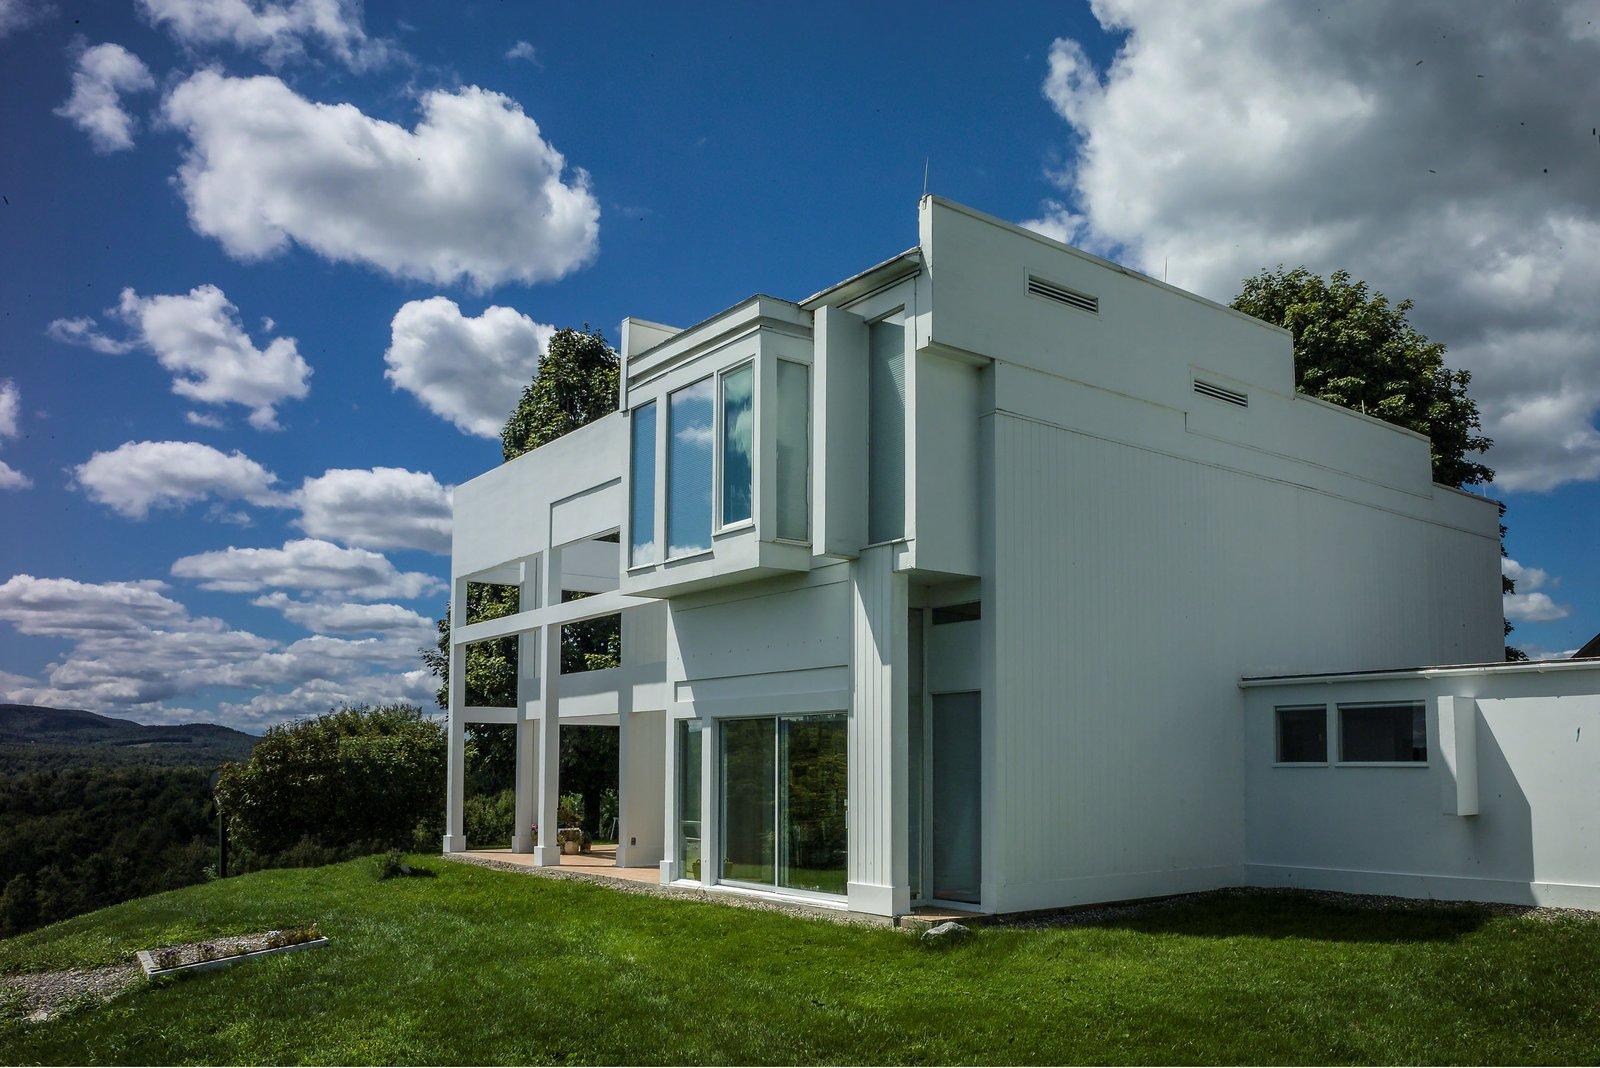 House II / Falk House: View of rear elevation  House II / Falk House by Devin Colman